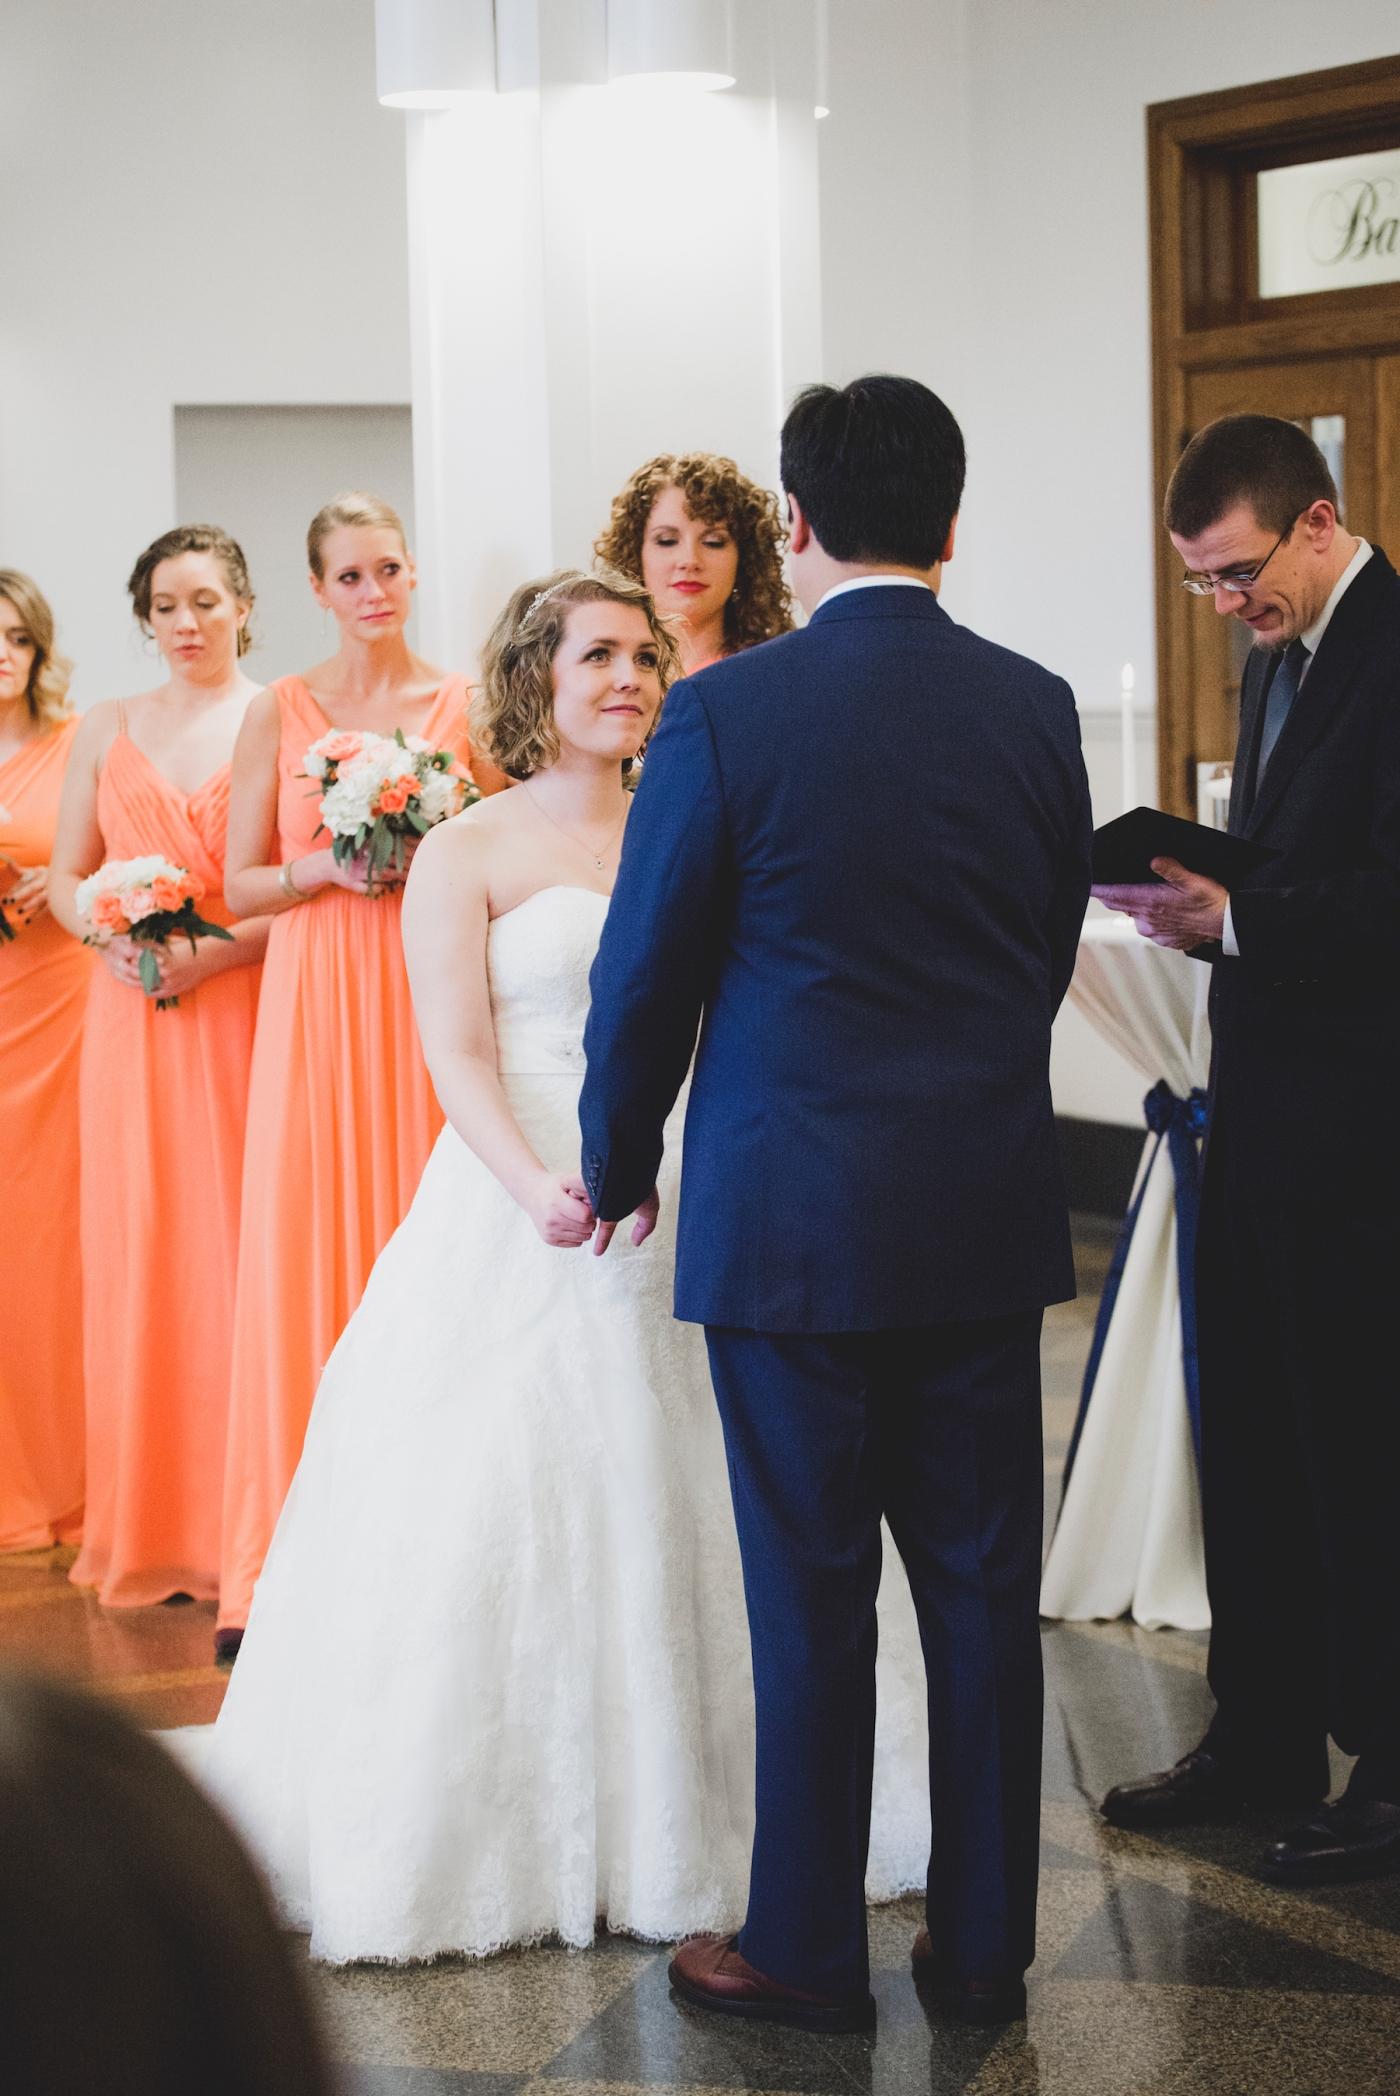 DSC_2699Everett_Wedding_Ballroom_Jane_Speleers_photography_Rachel_and_Edmund_Ceremony_2017